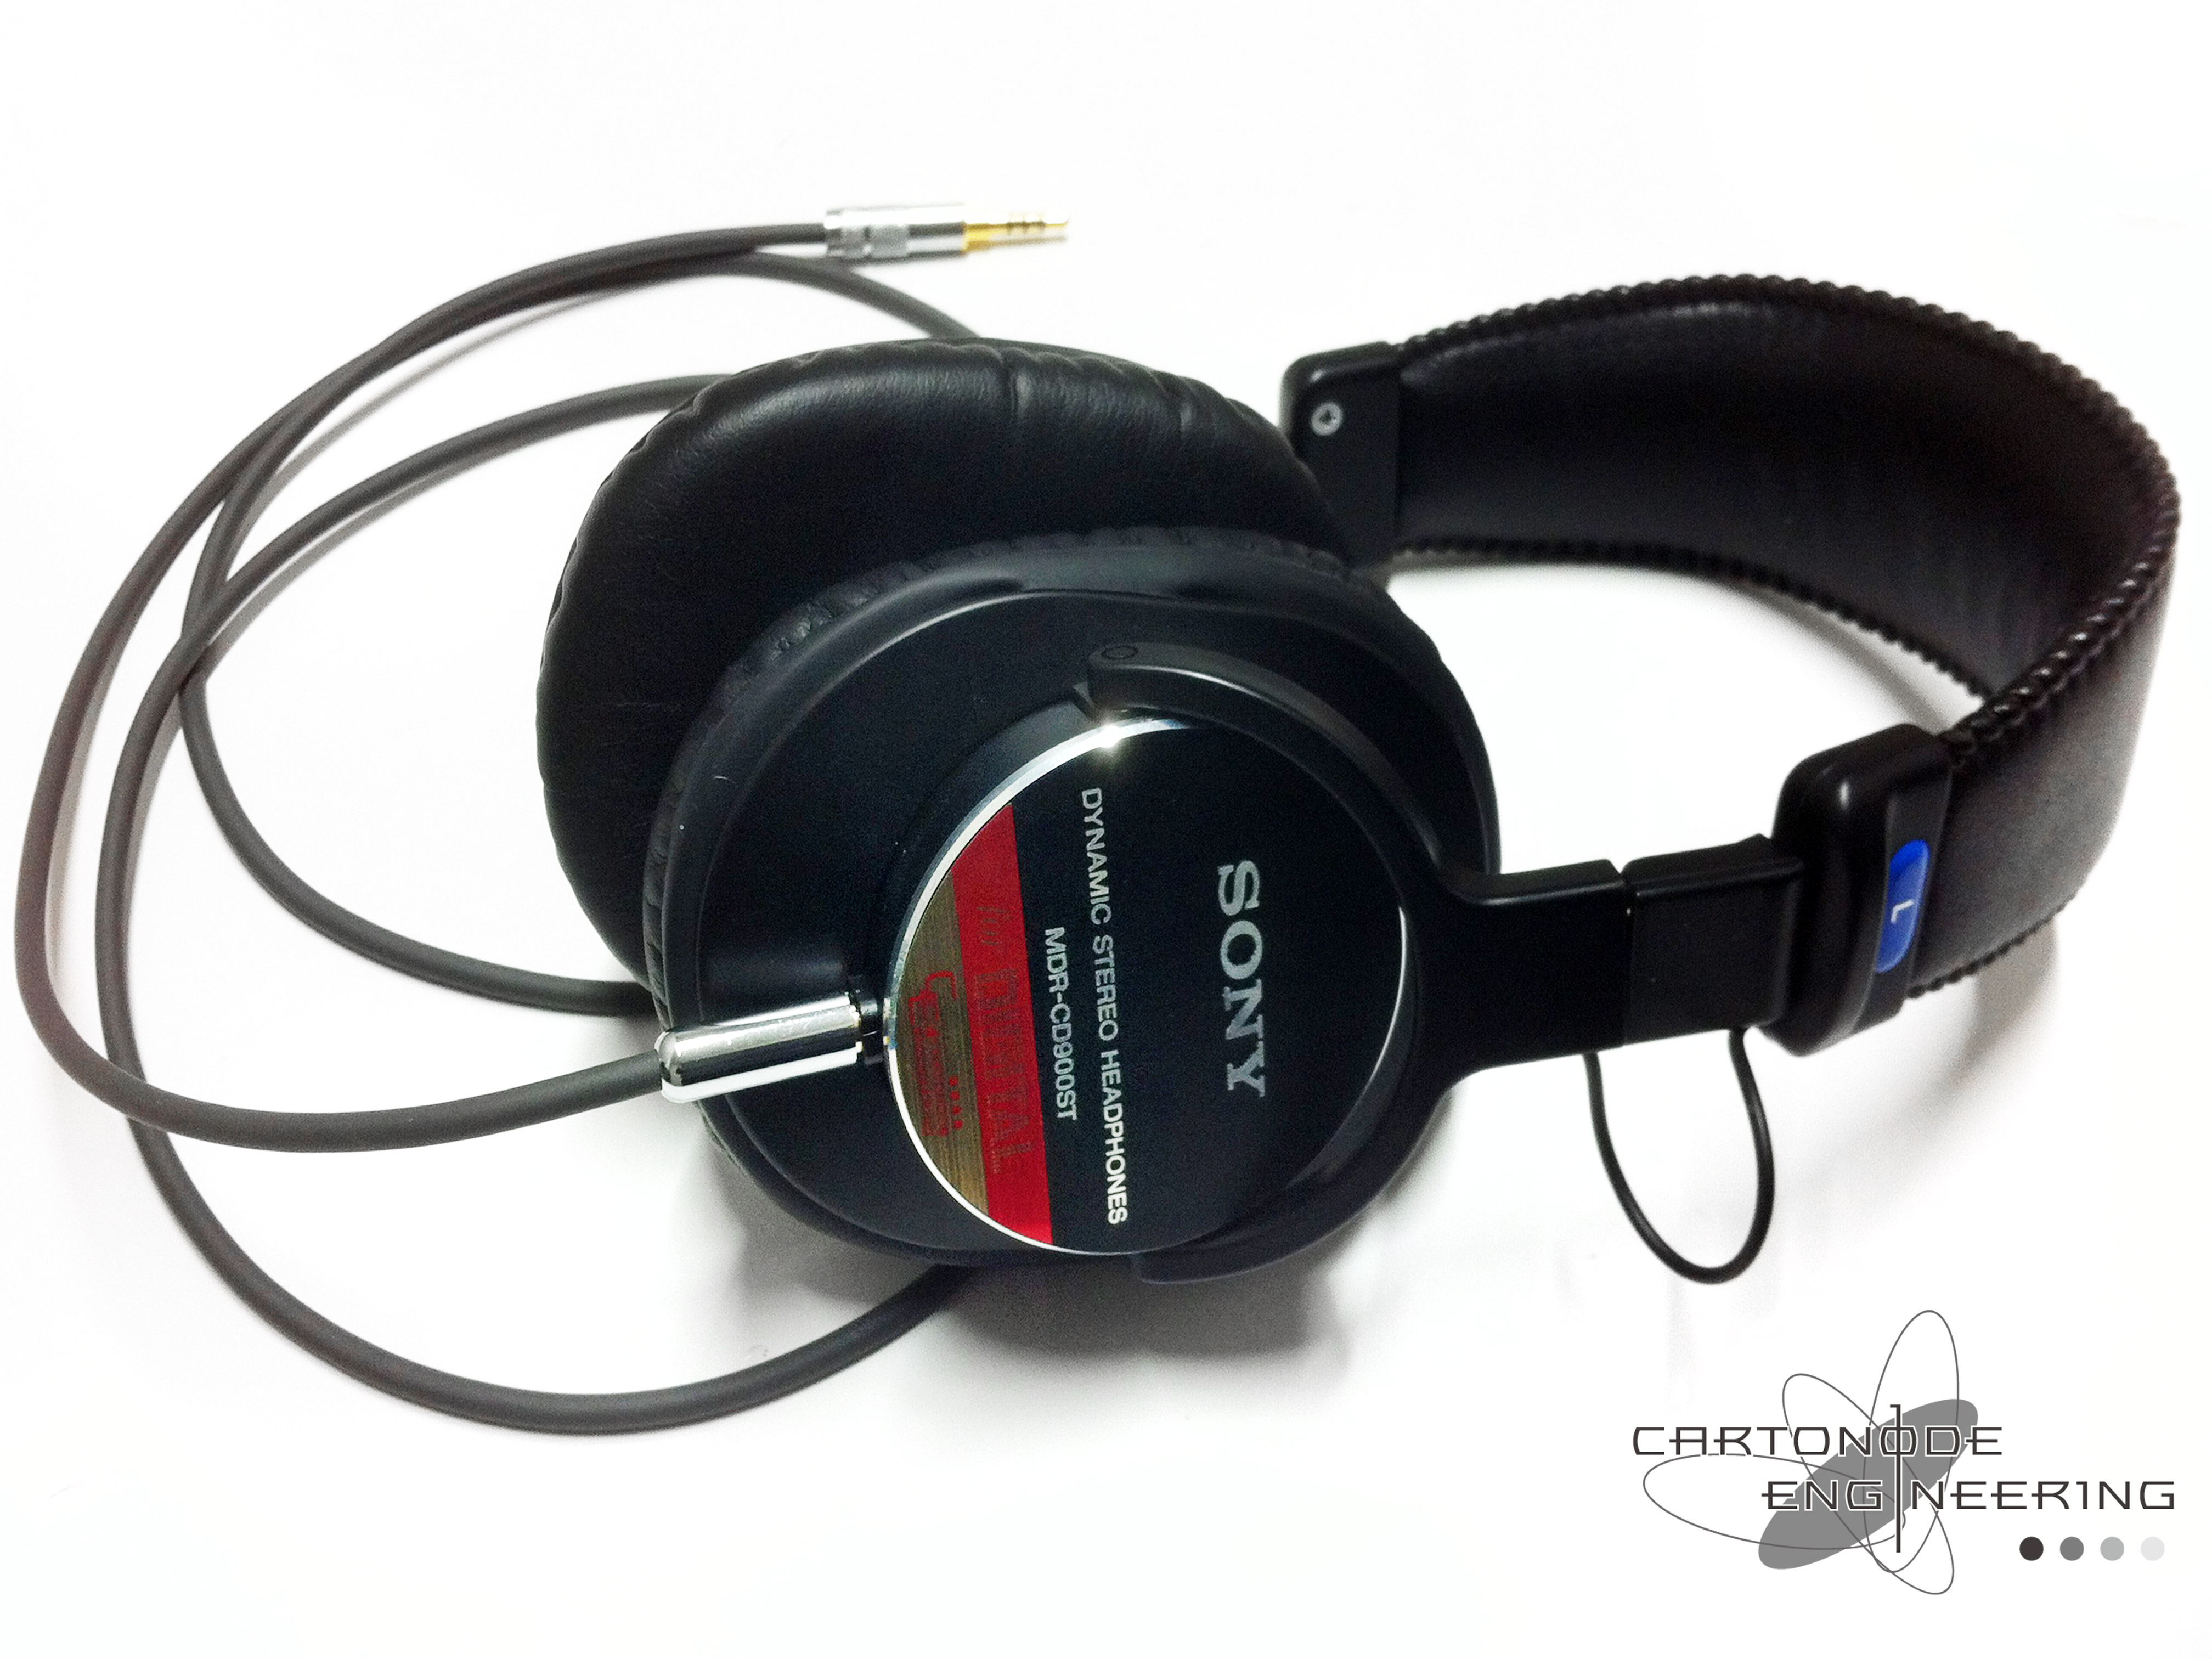 MDR-CD900ST バランス駆動 ケーブル脱着仕様